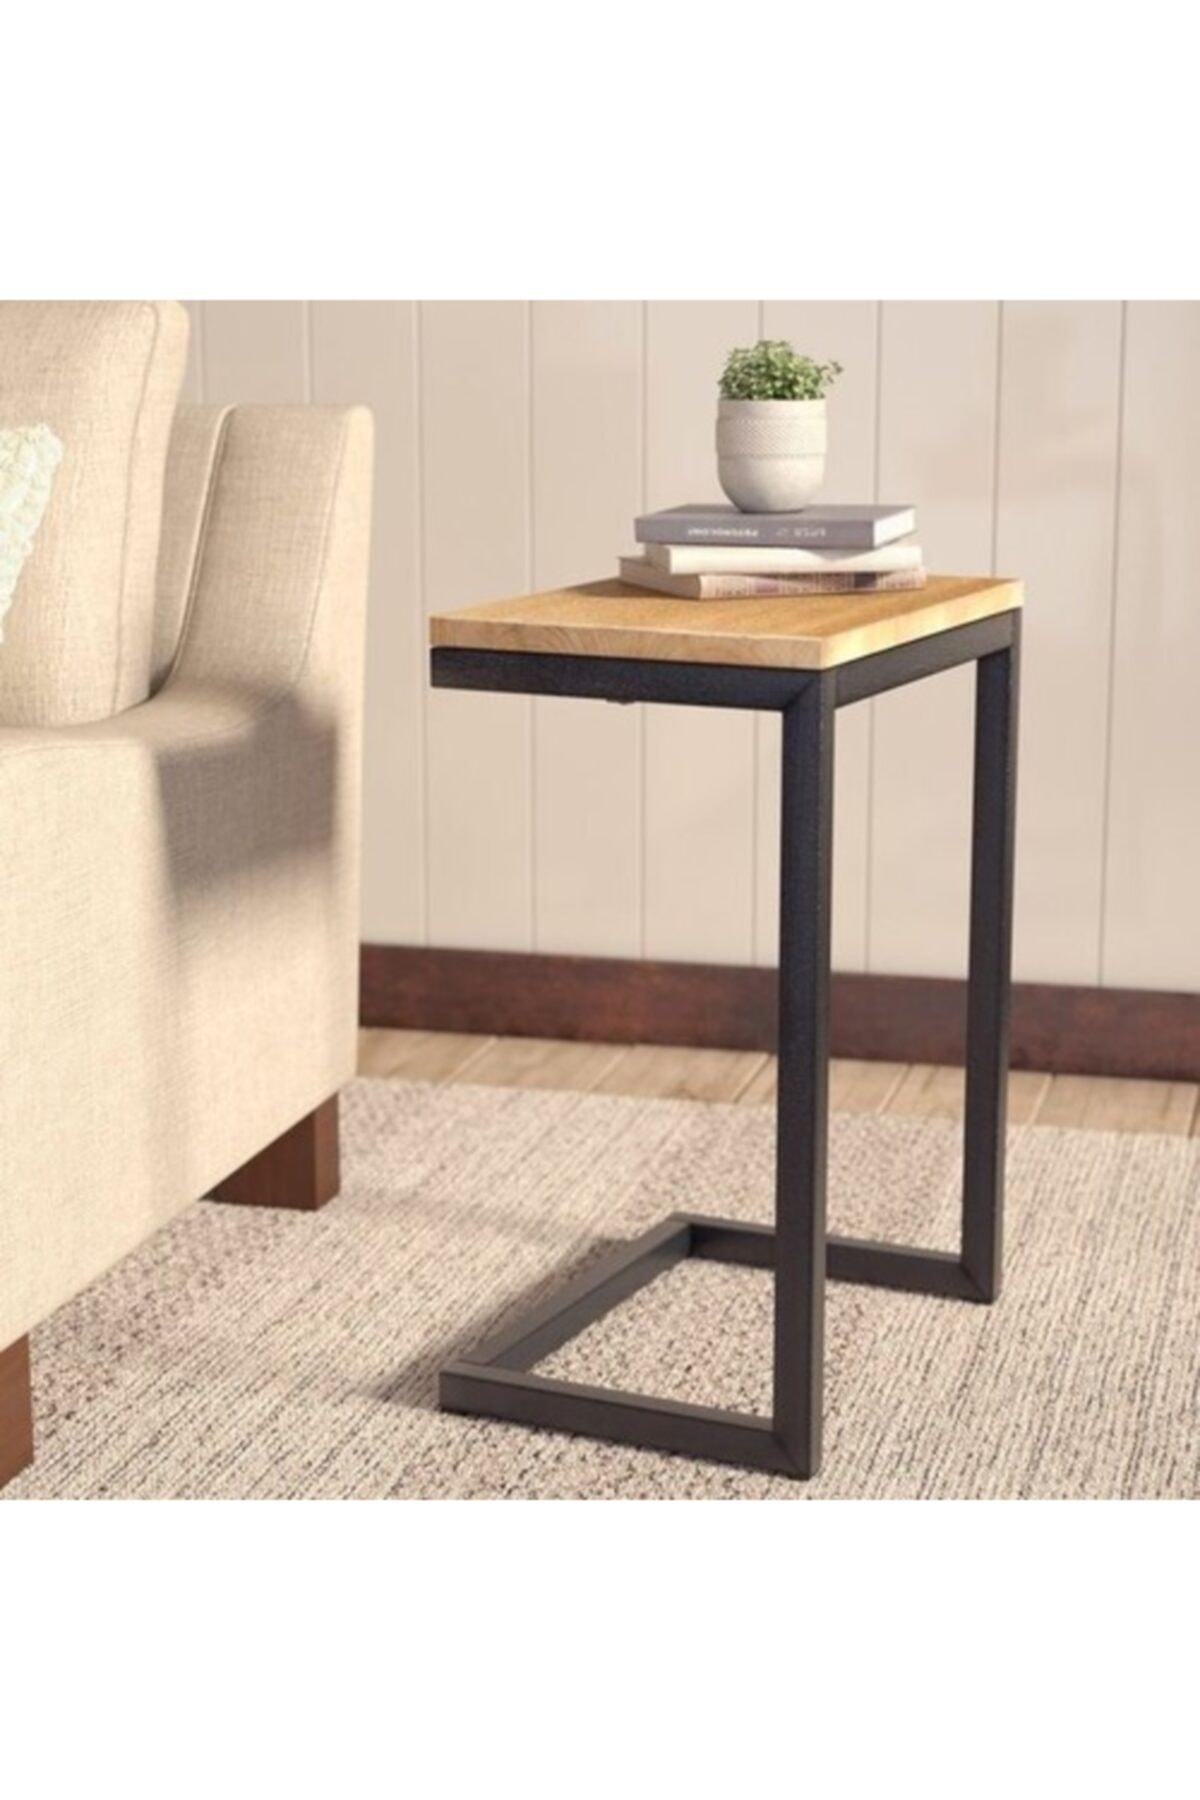 Dekoratif Metal Ahşap Yan Sehpa C Tipi Sehpa Zigon Sehpa  Oturma Odası Moda Dekor modern ahşap kahverengi sehpa kahve sehpası çay sehpası meyve masası kanepe yanı oturma odası için mobilya sehpa